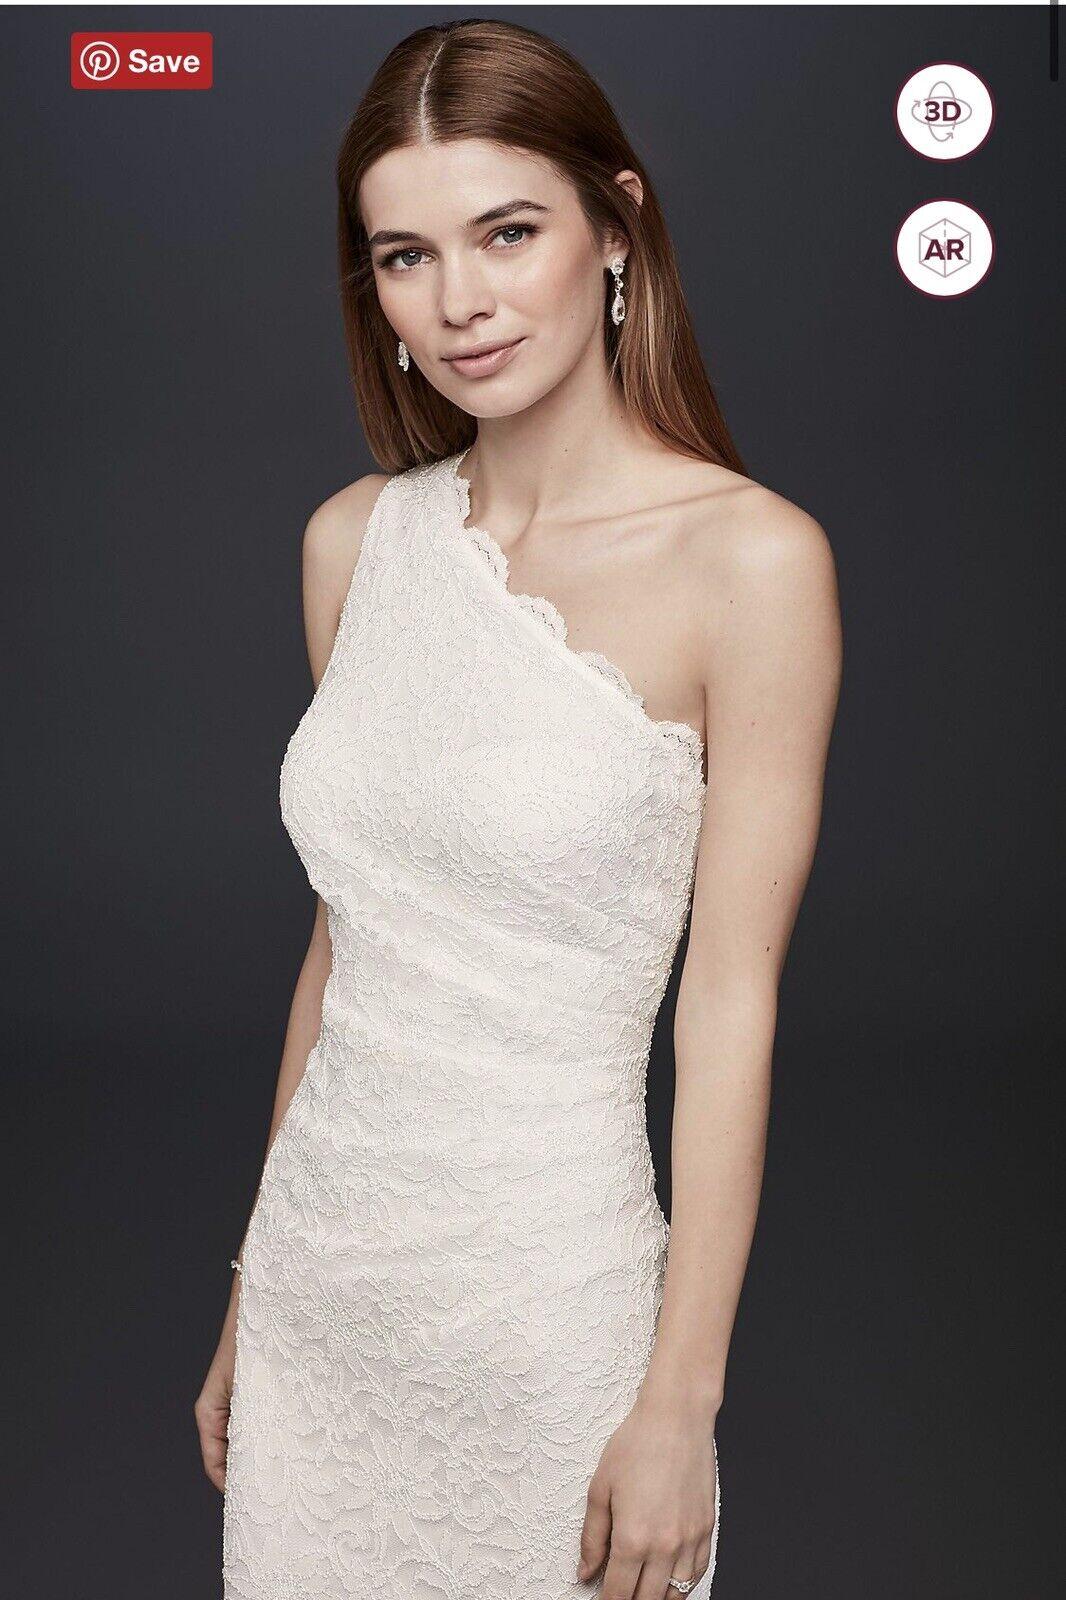 davids bridal wedding dress size 10 Scalloped One-Shoulder Lace Sheath Gown